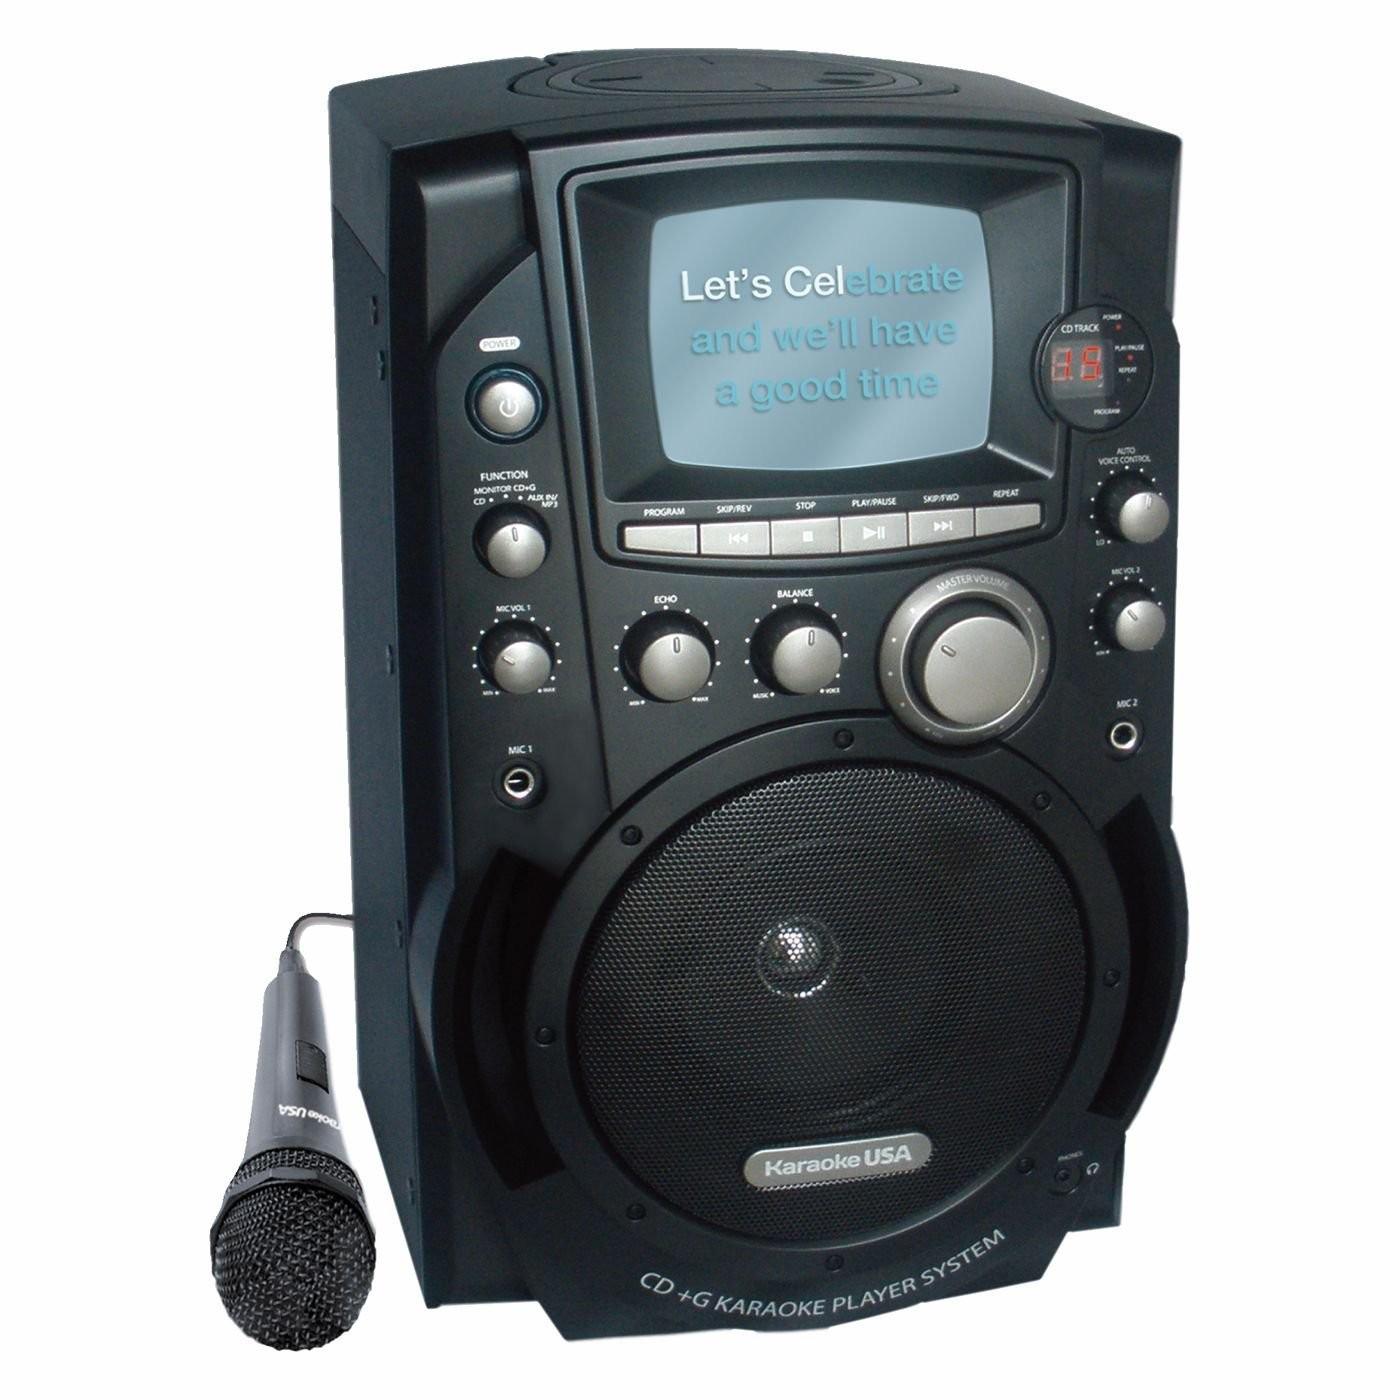 Karaoke USA GQ753 CD+G Karaoke System with 5.5in Screen